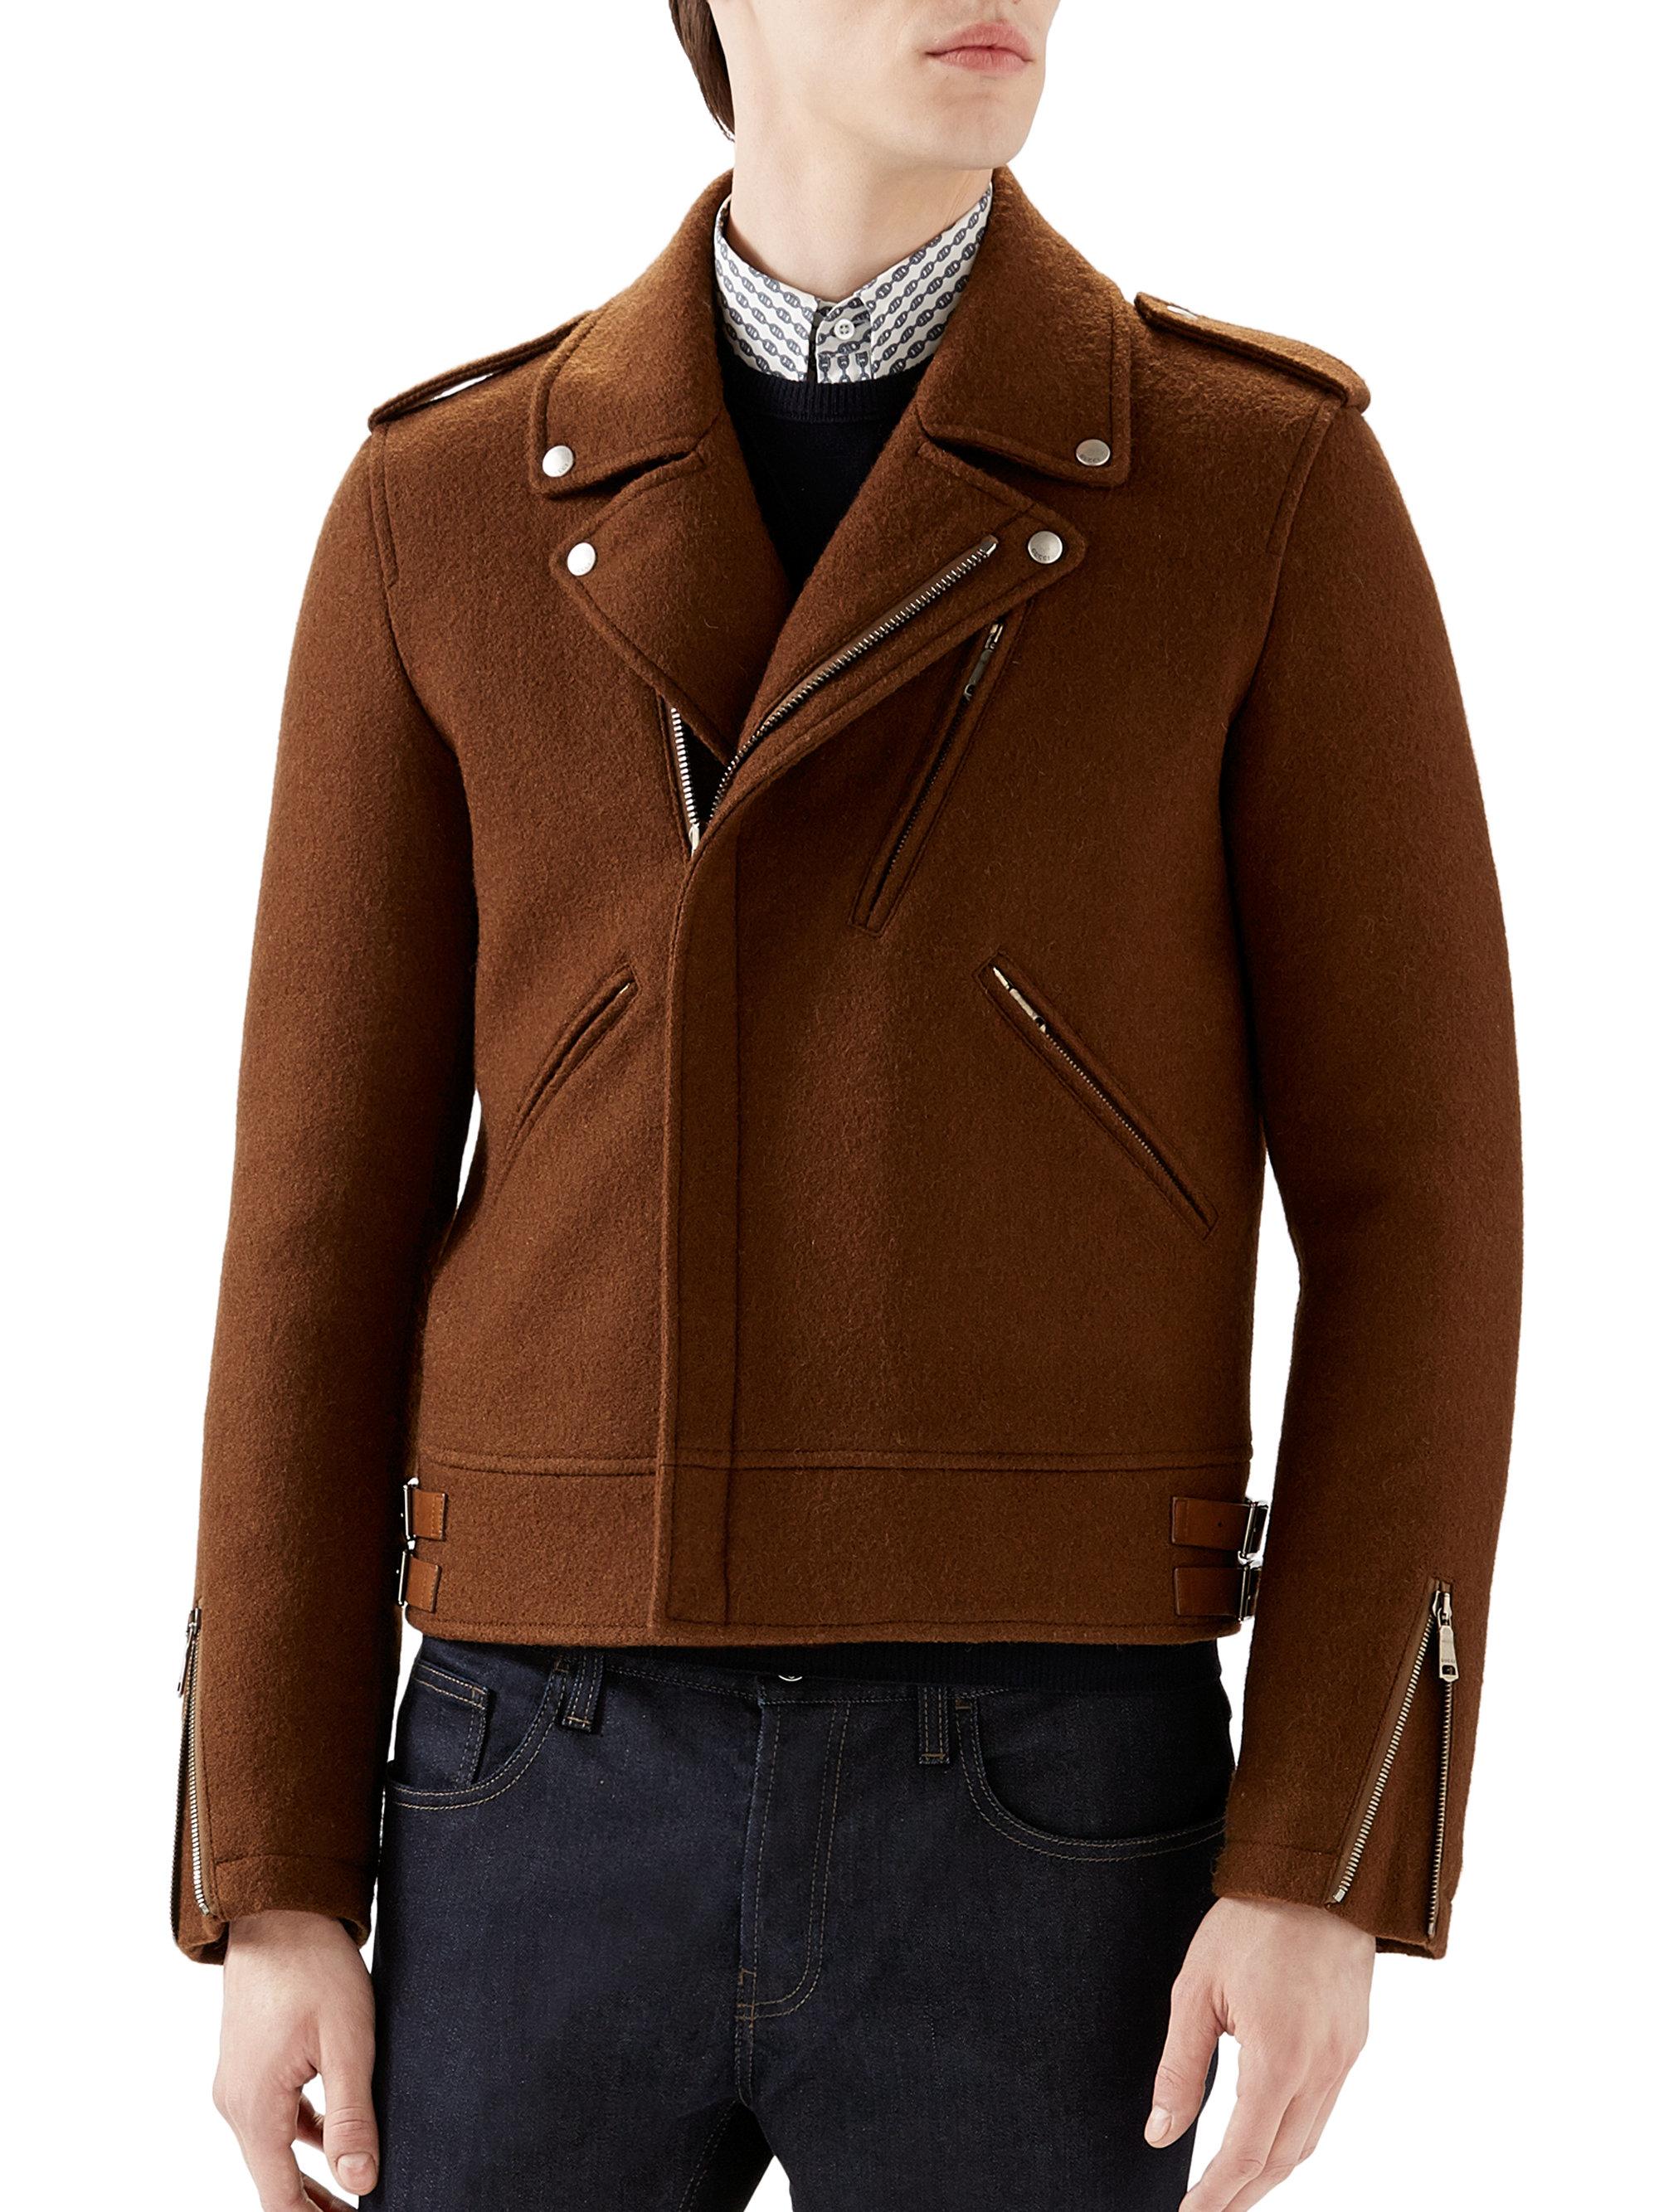 Lyst Gucci Wool Biker Jacket In Brown For Men